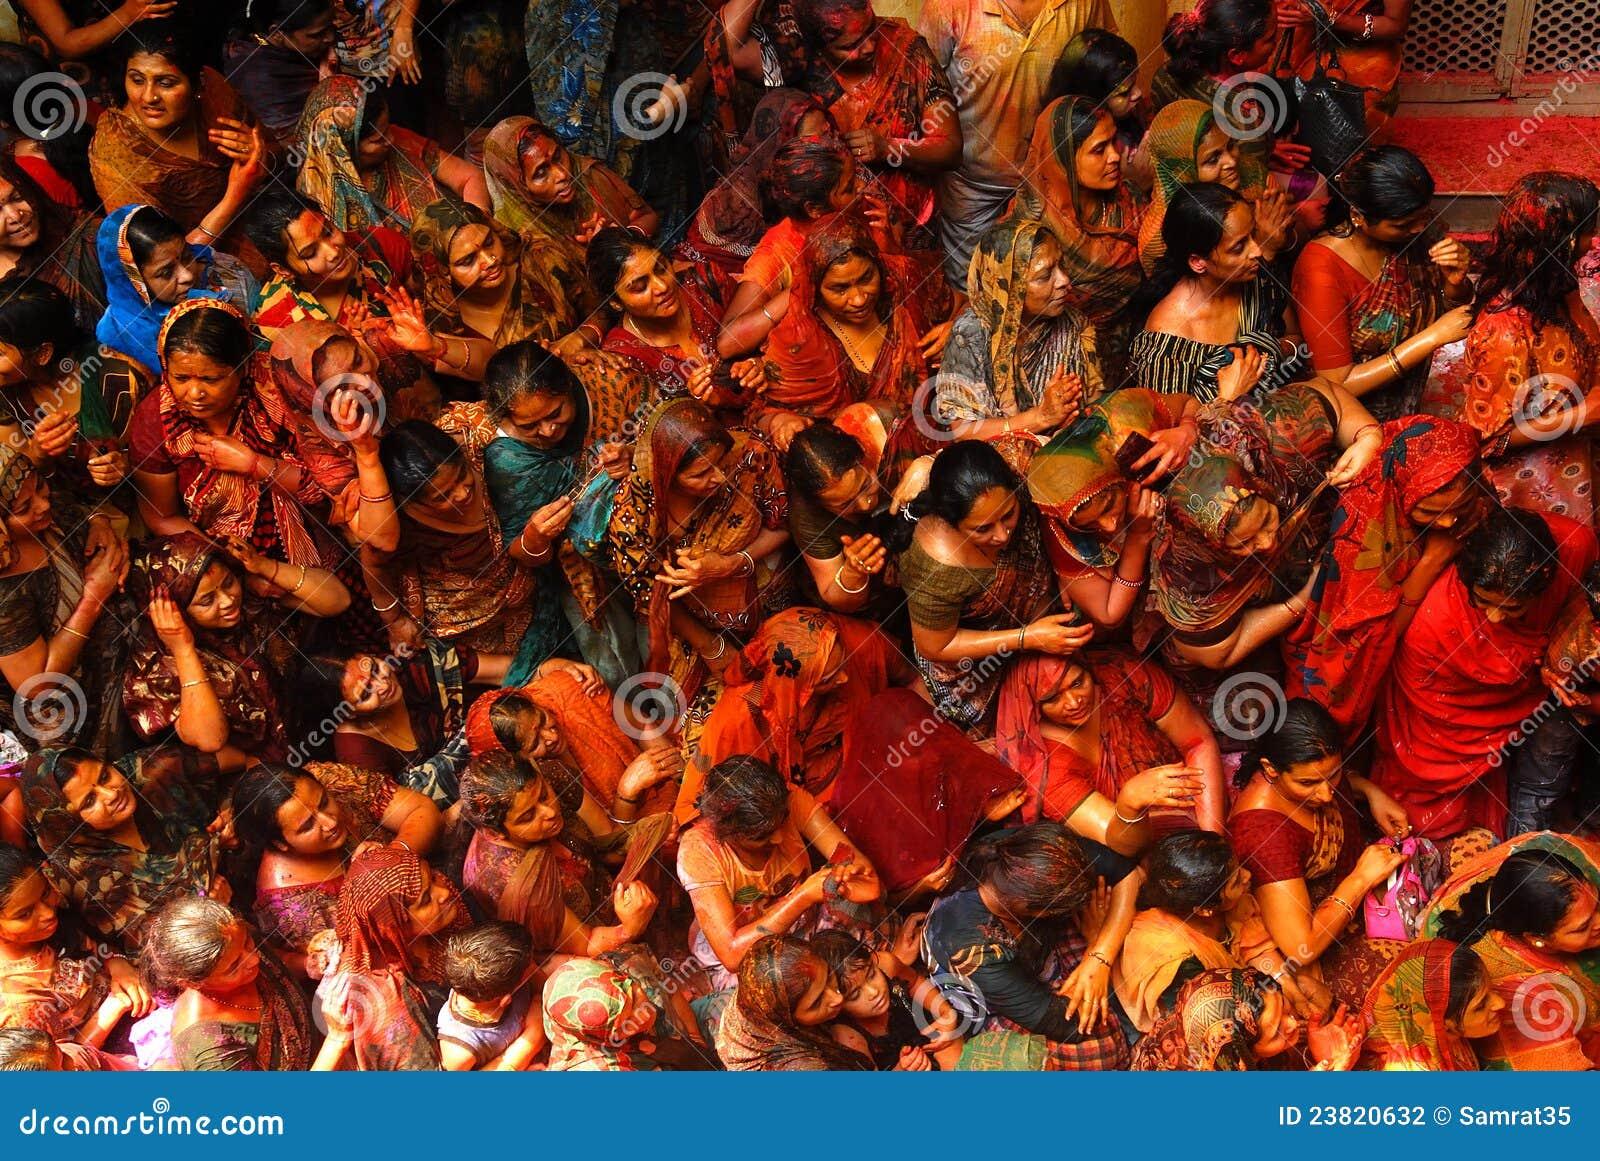 Festival de Holi en la India